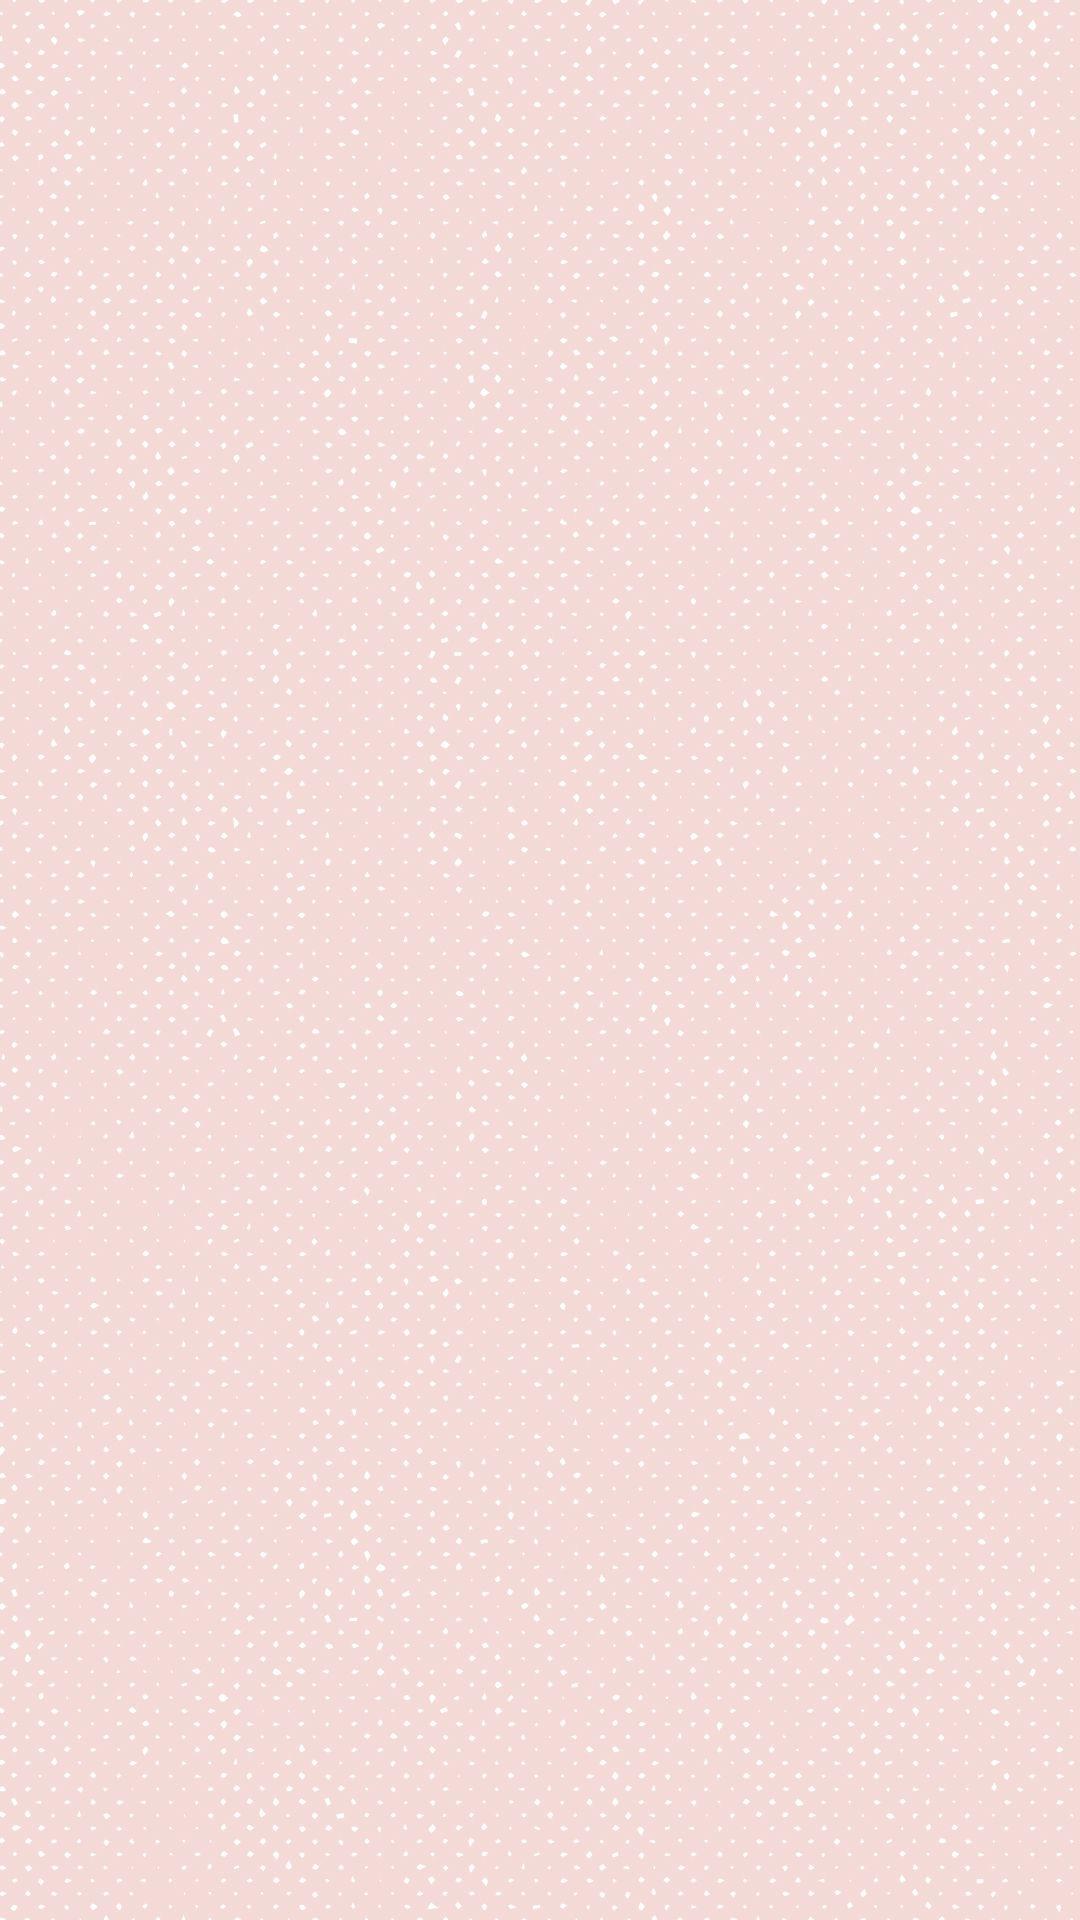 Download   Wallpaper Home Screen Rose Gold - b04b1755af76d37d869fd1267cee9837  2018_661094.jpg